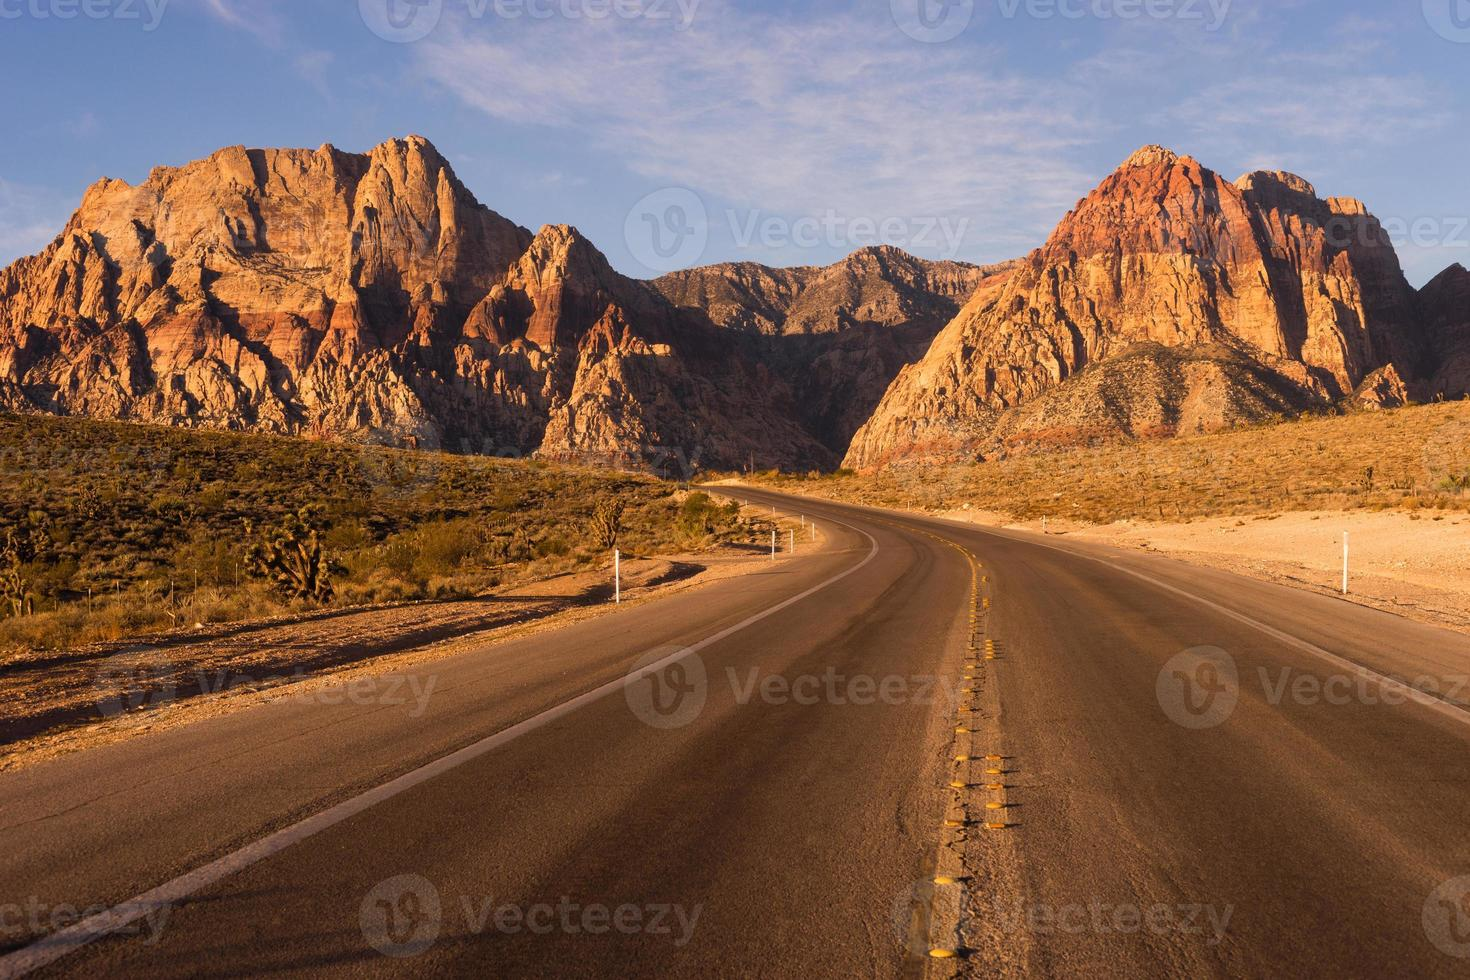 Carretera de dos carriles Red Rock Canyon Las Vegas, EE.UU. foto